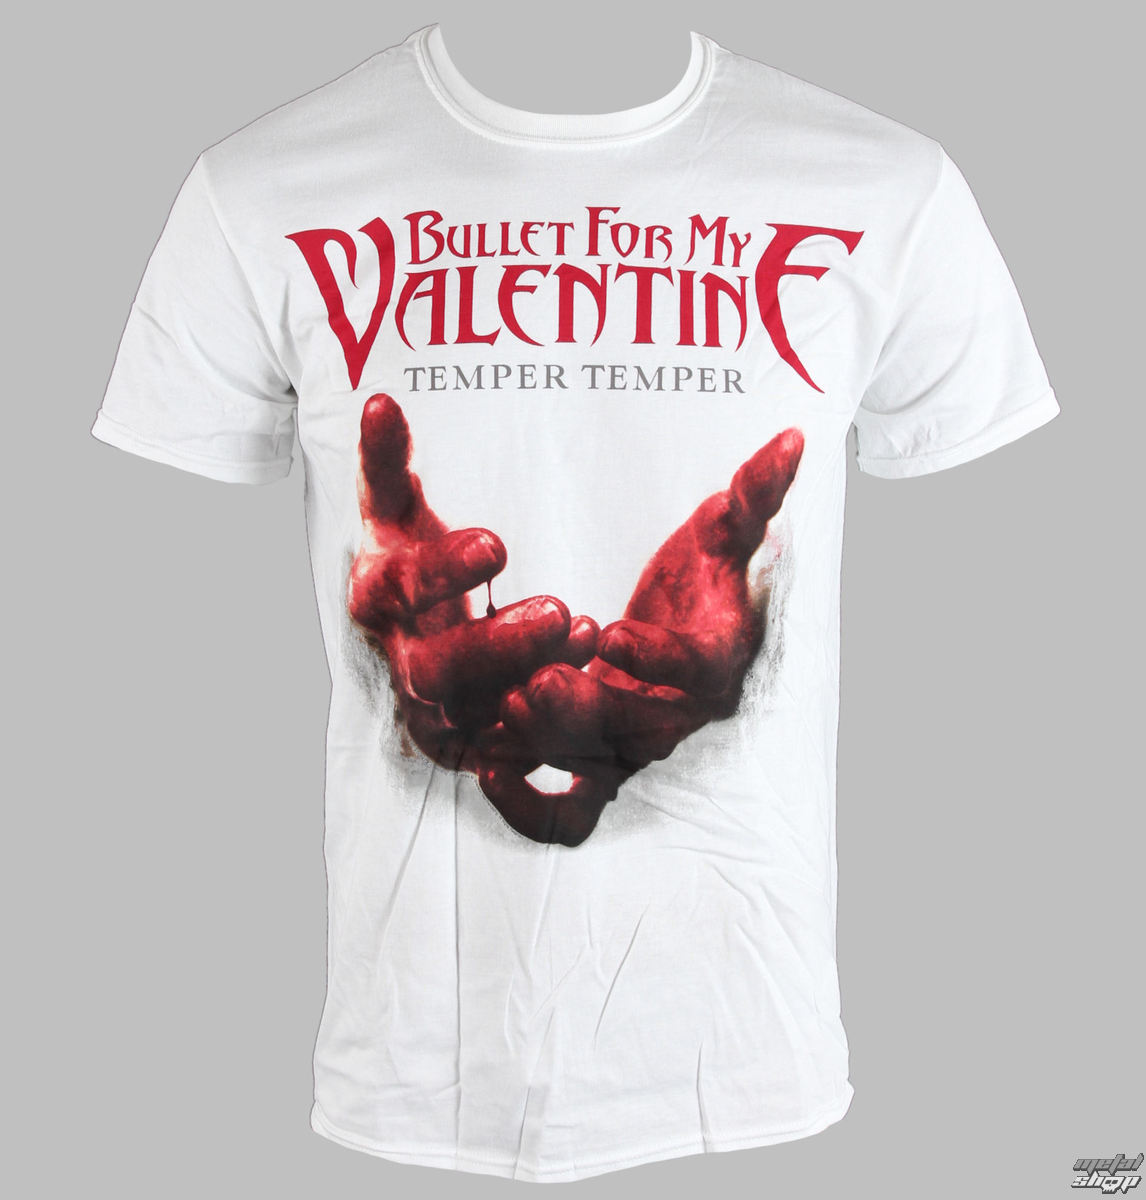 Schön Tričko Pánské Bullet For My Valentine   Temper Temper Blood Hands   BRAVADO  EU